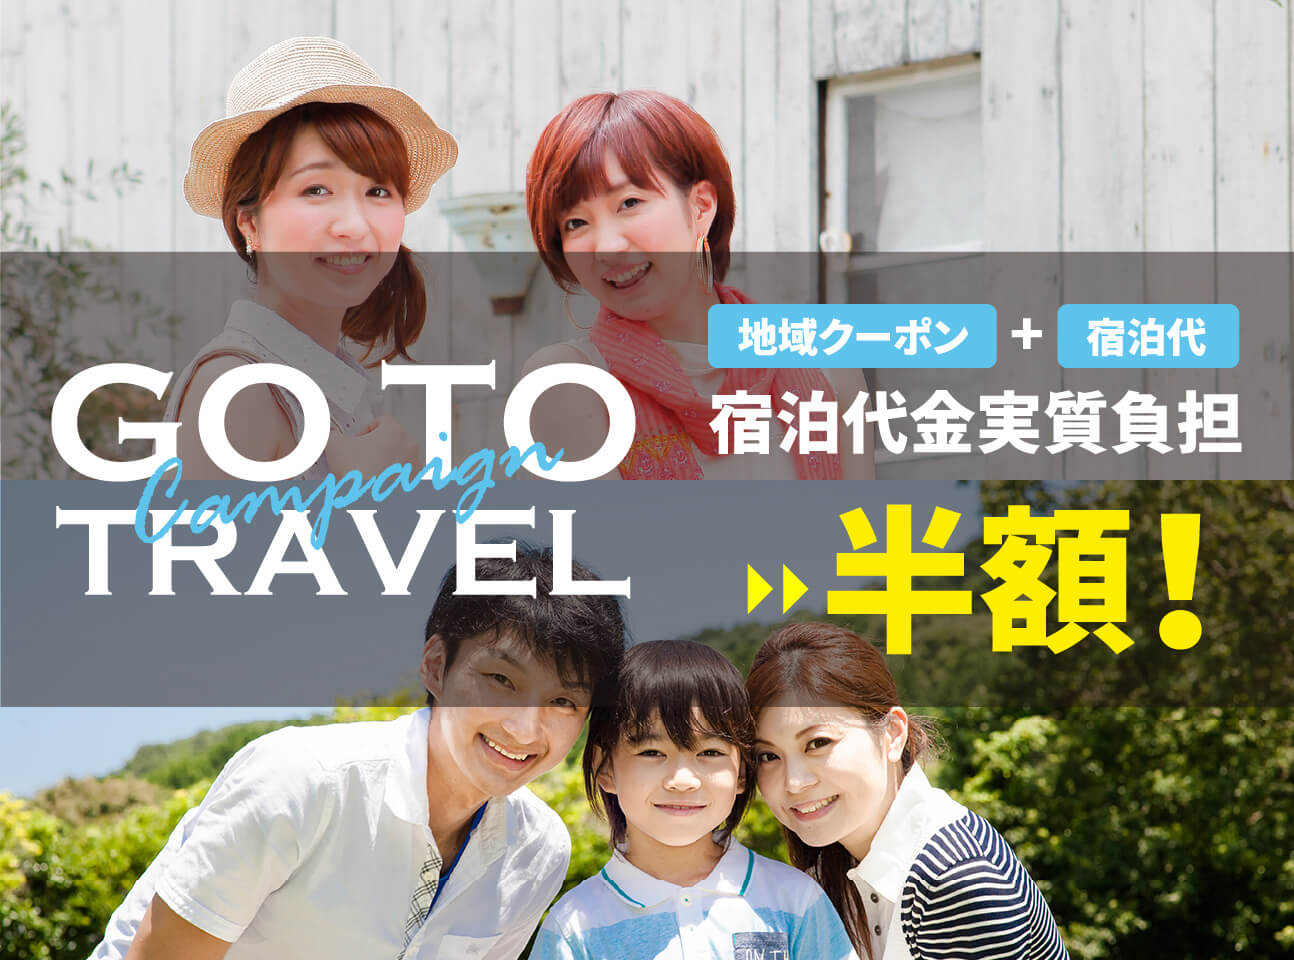 GO TO TRAVELキャンペーン 地域クーポン+宿泊代 宿泊代金実質負担 半額!